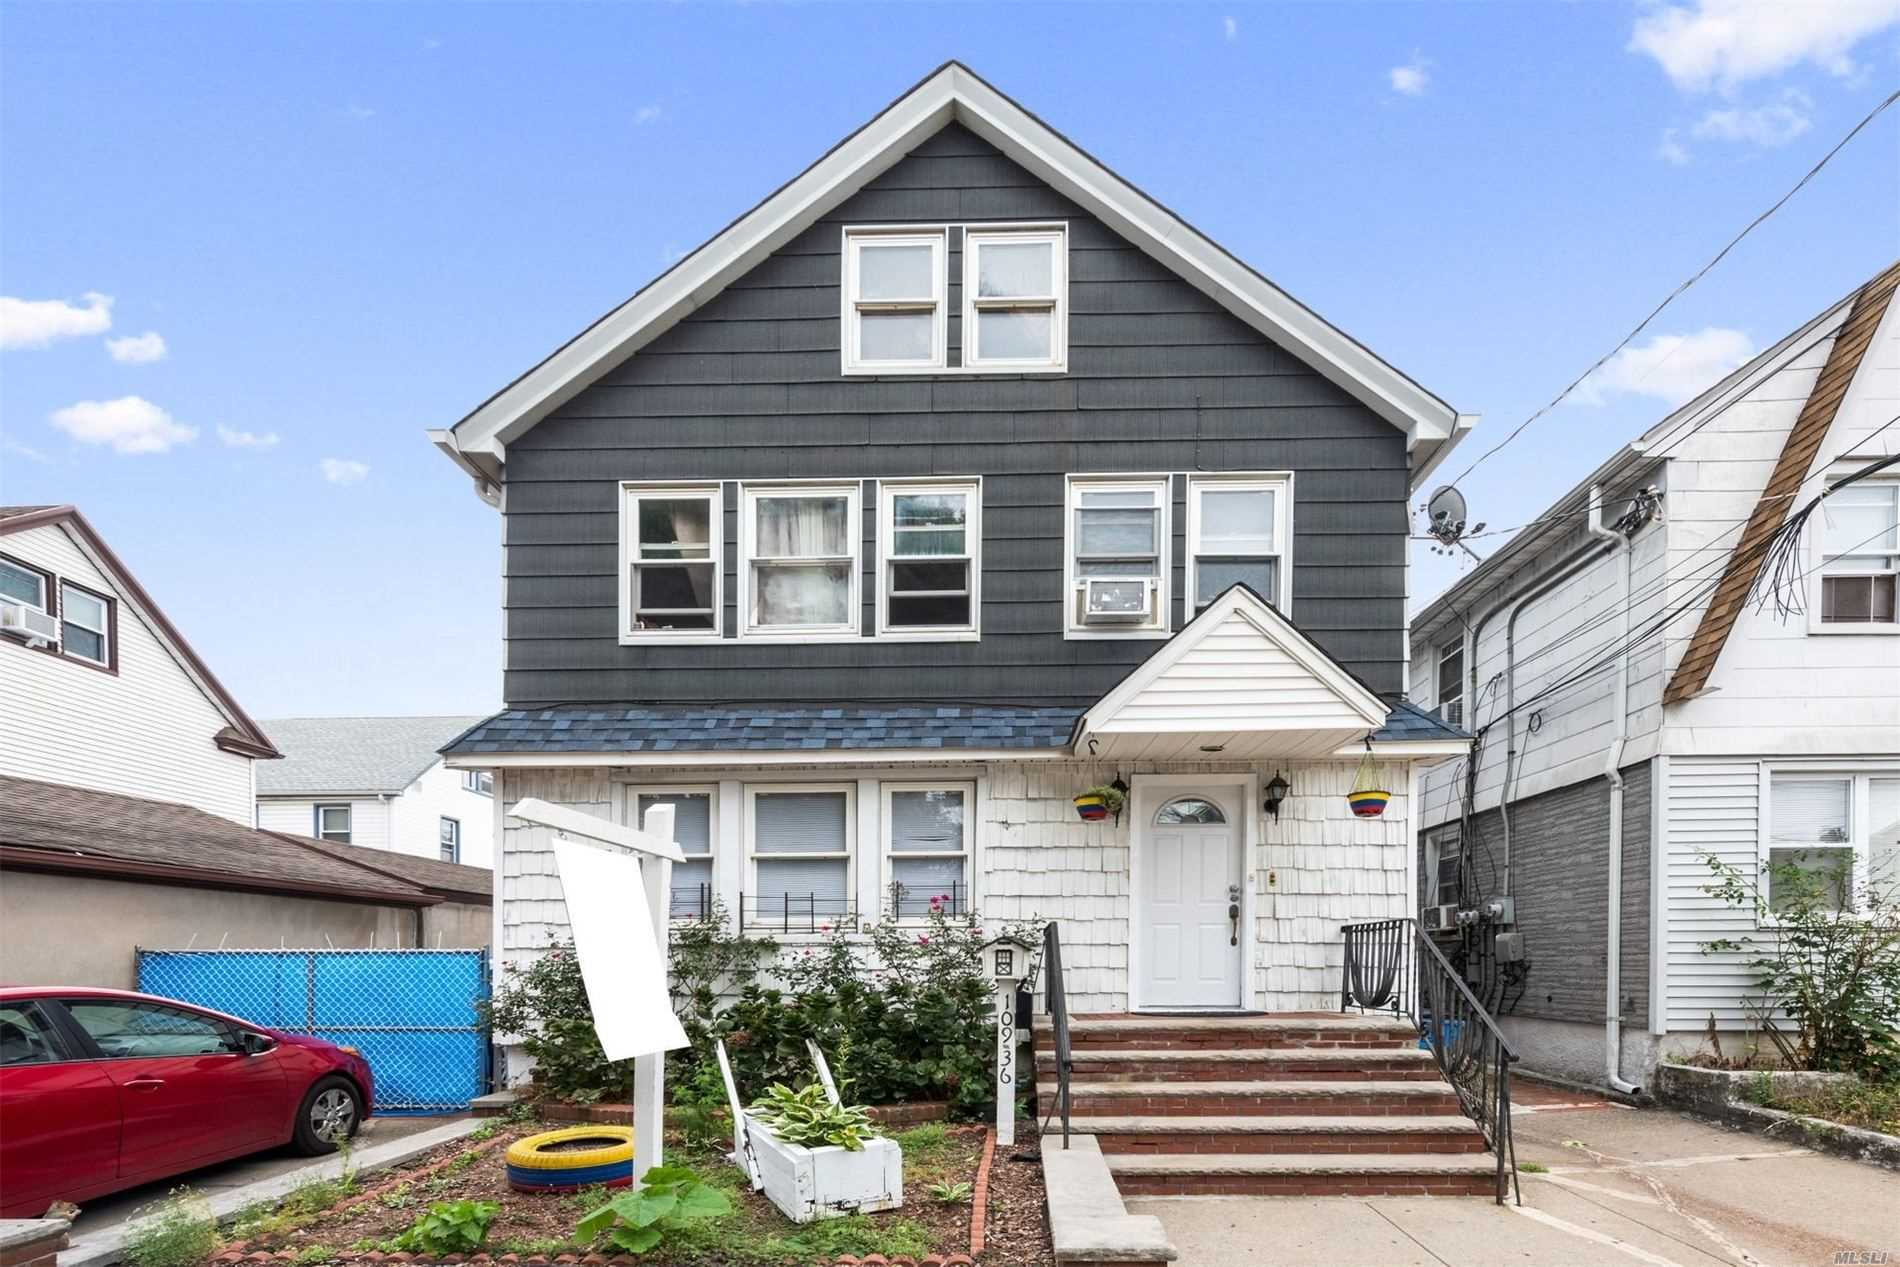 Property for sale at 109-36 97th Street, Ozone Park NY 11417, Ozone Park,  New York 11417